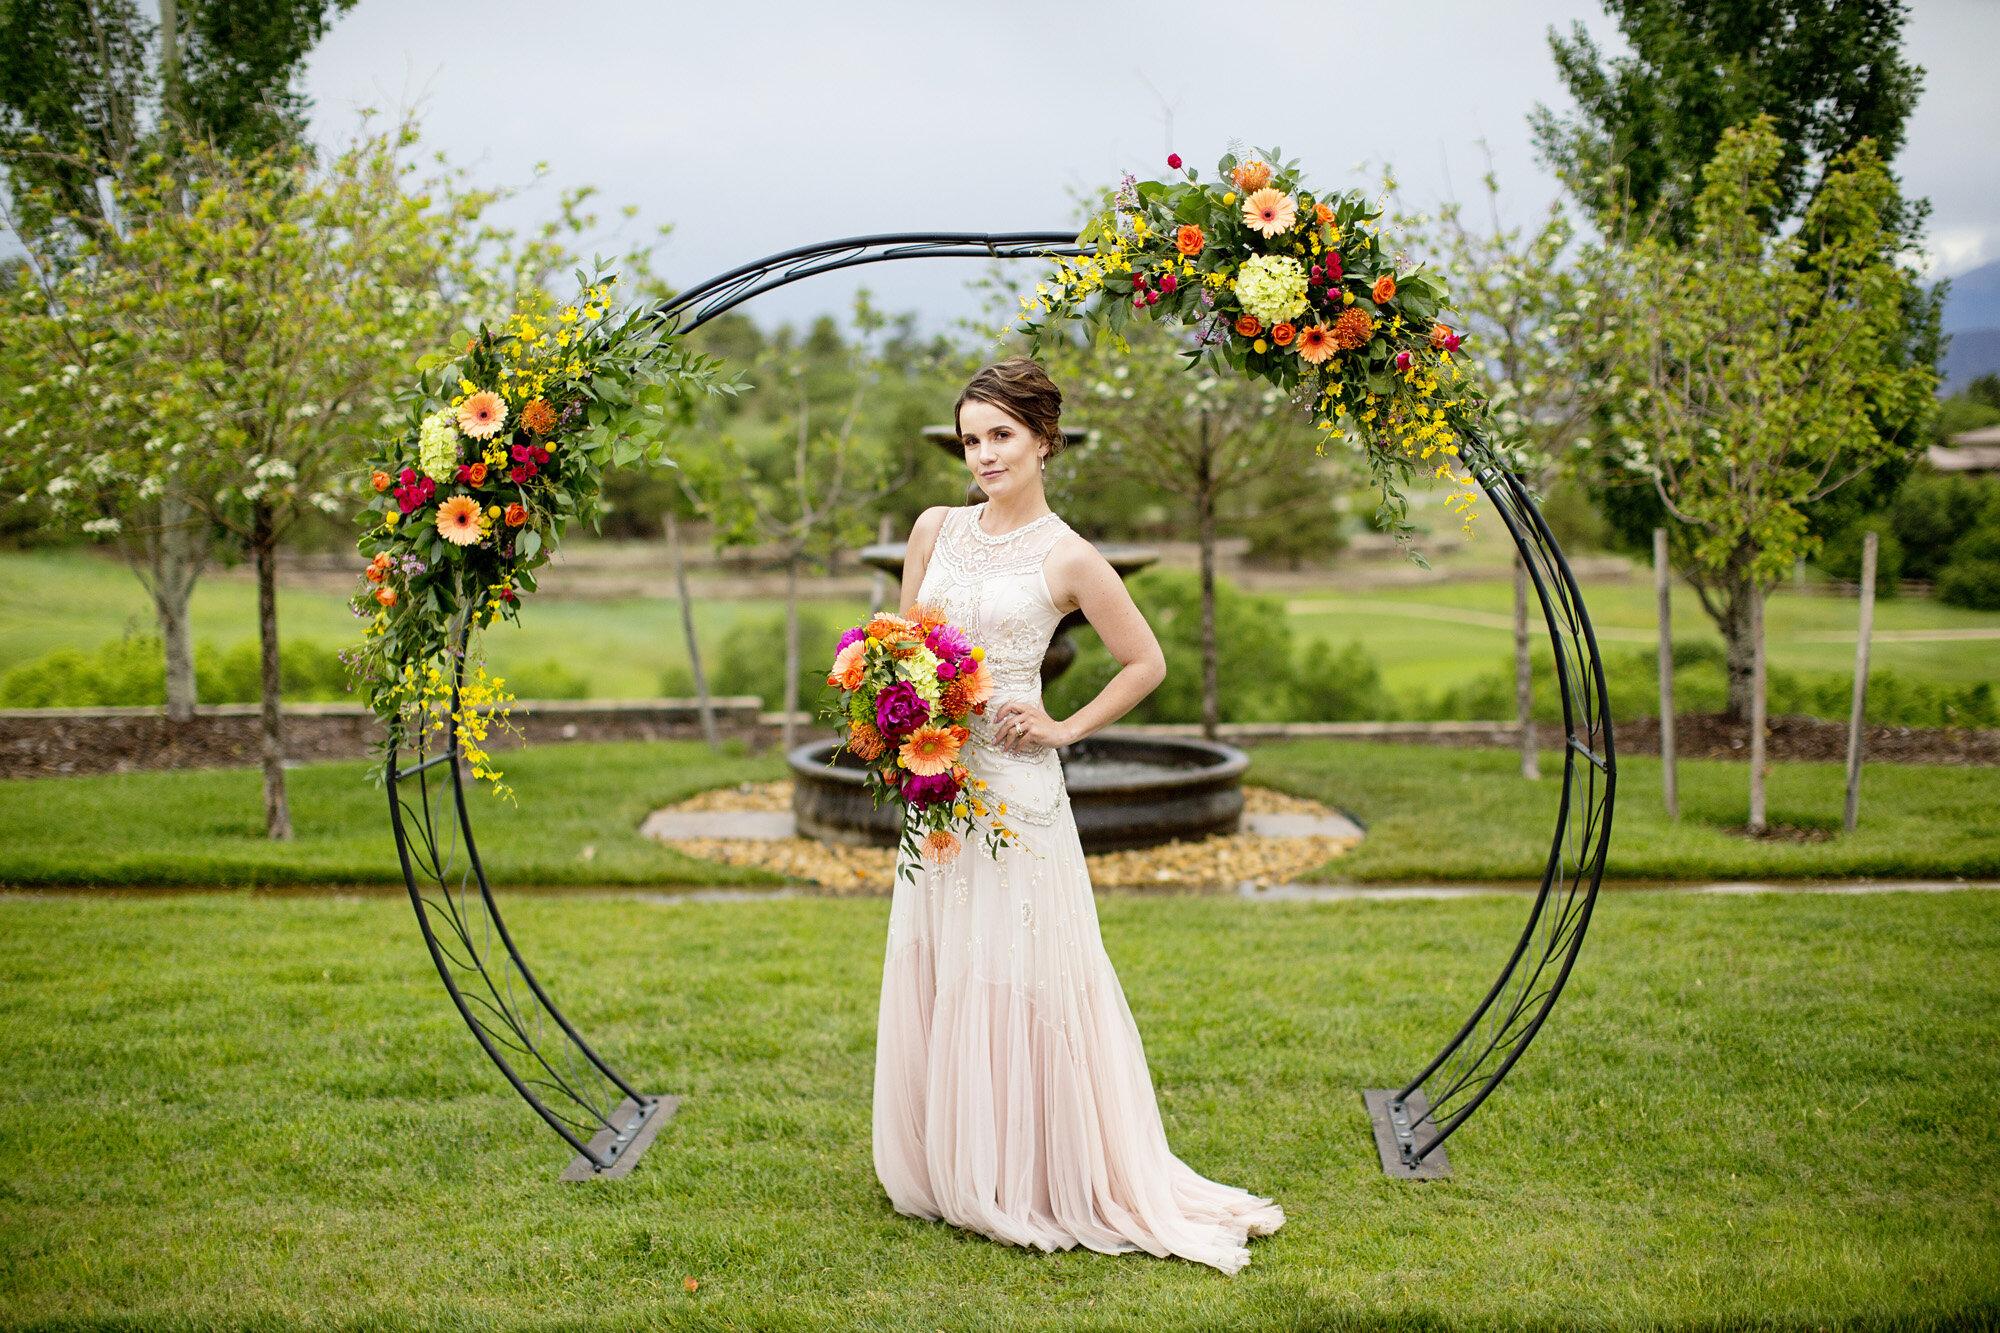 Seriously_Sabrina_Photography_Colorado_Springs_Club_at_Flying_Horse_Destination_Wedding_ODwyer65.jpg